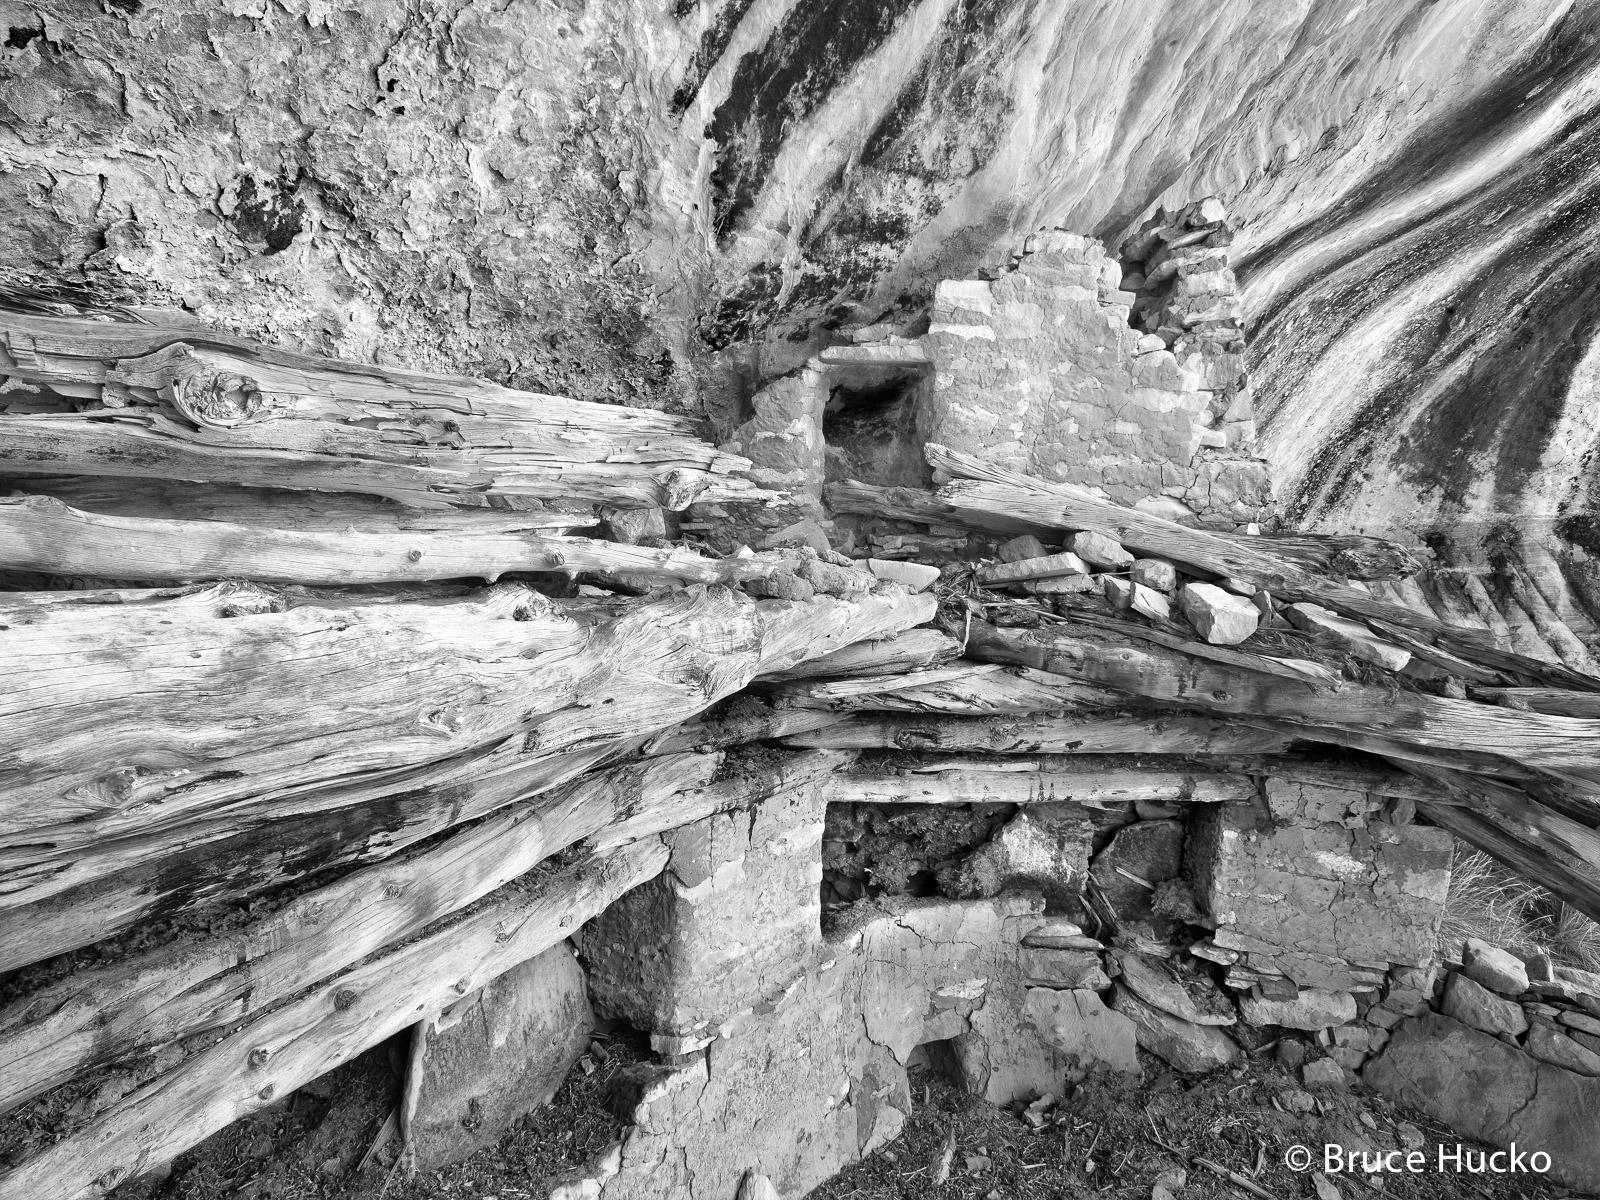 Cedar Mesa,Cedar Mesa Canyons Four Corners area,anasazi,anasazi ruins,ancestral puebloan,ancestral puebloan colorado plateau ruins ruins,colorado plateau ruins, photo